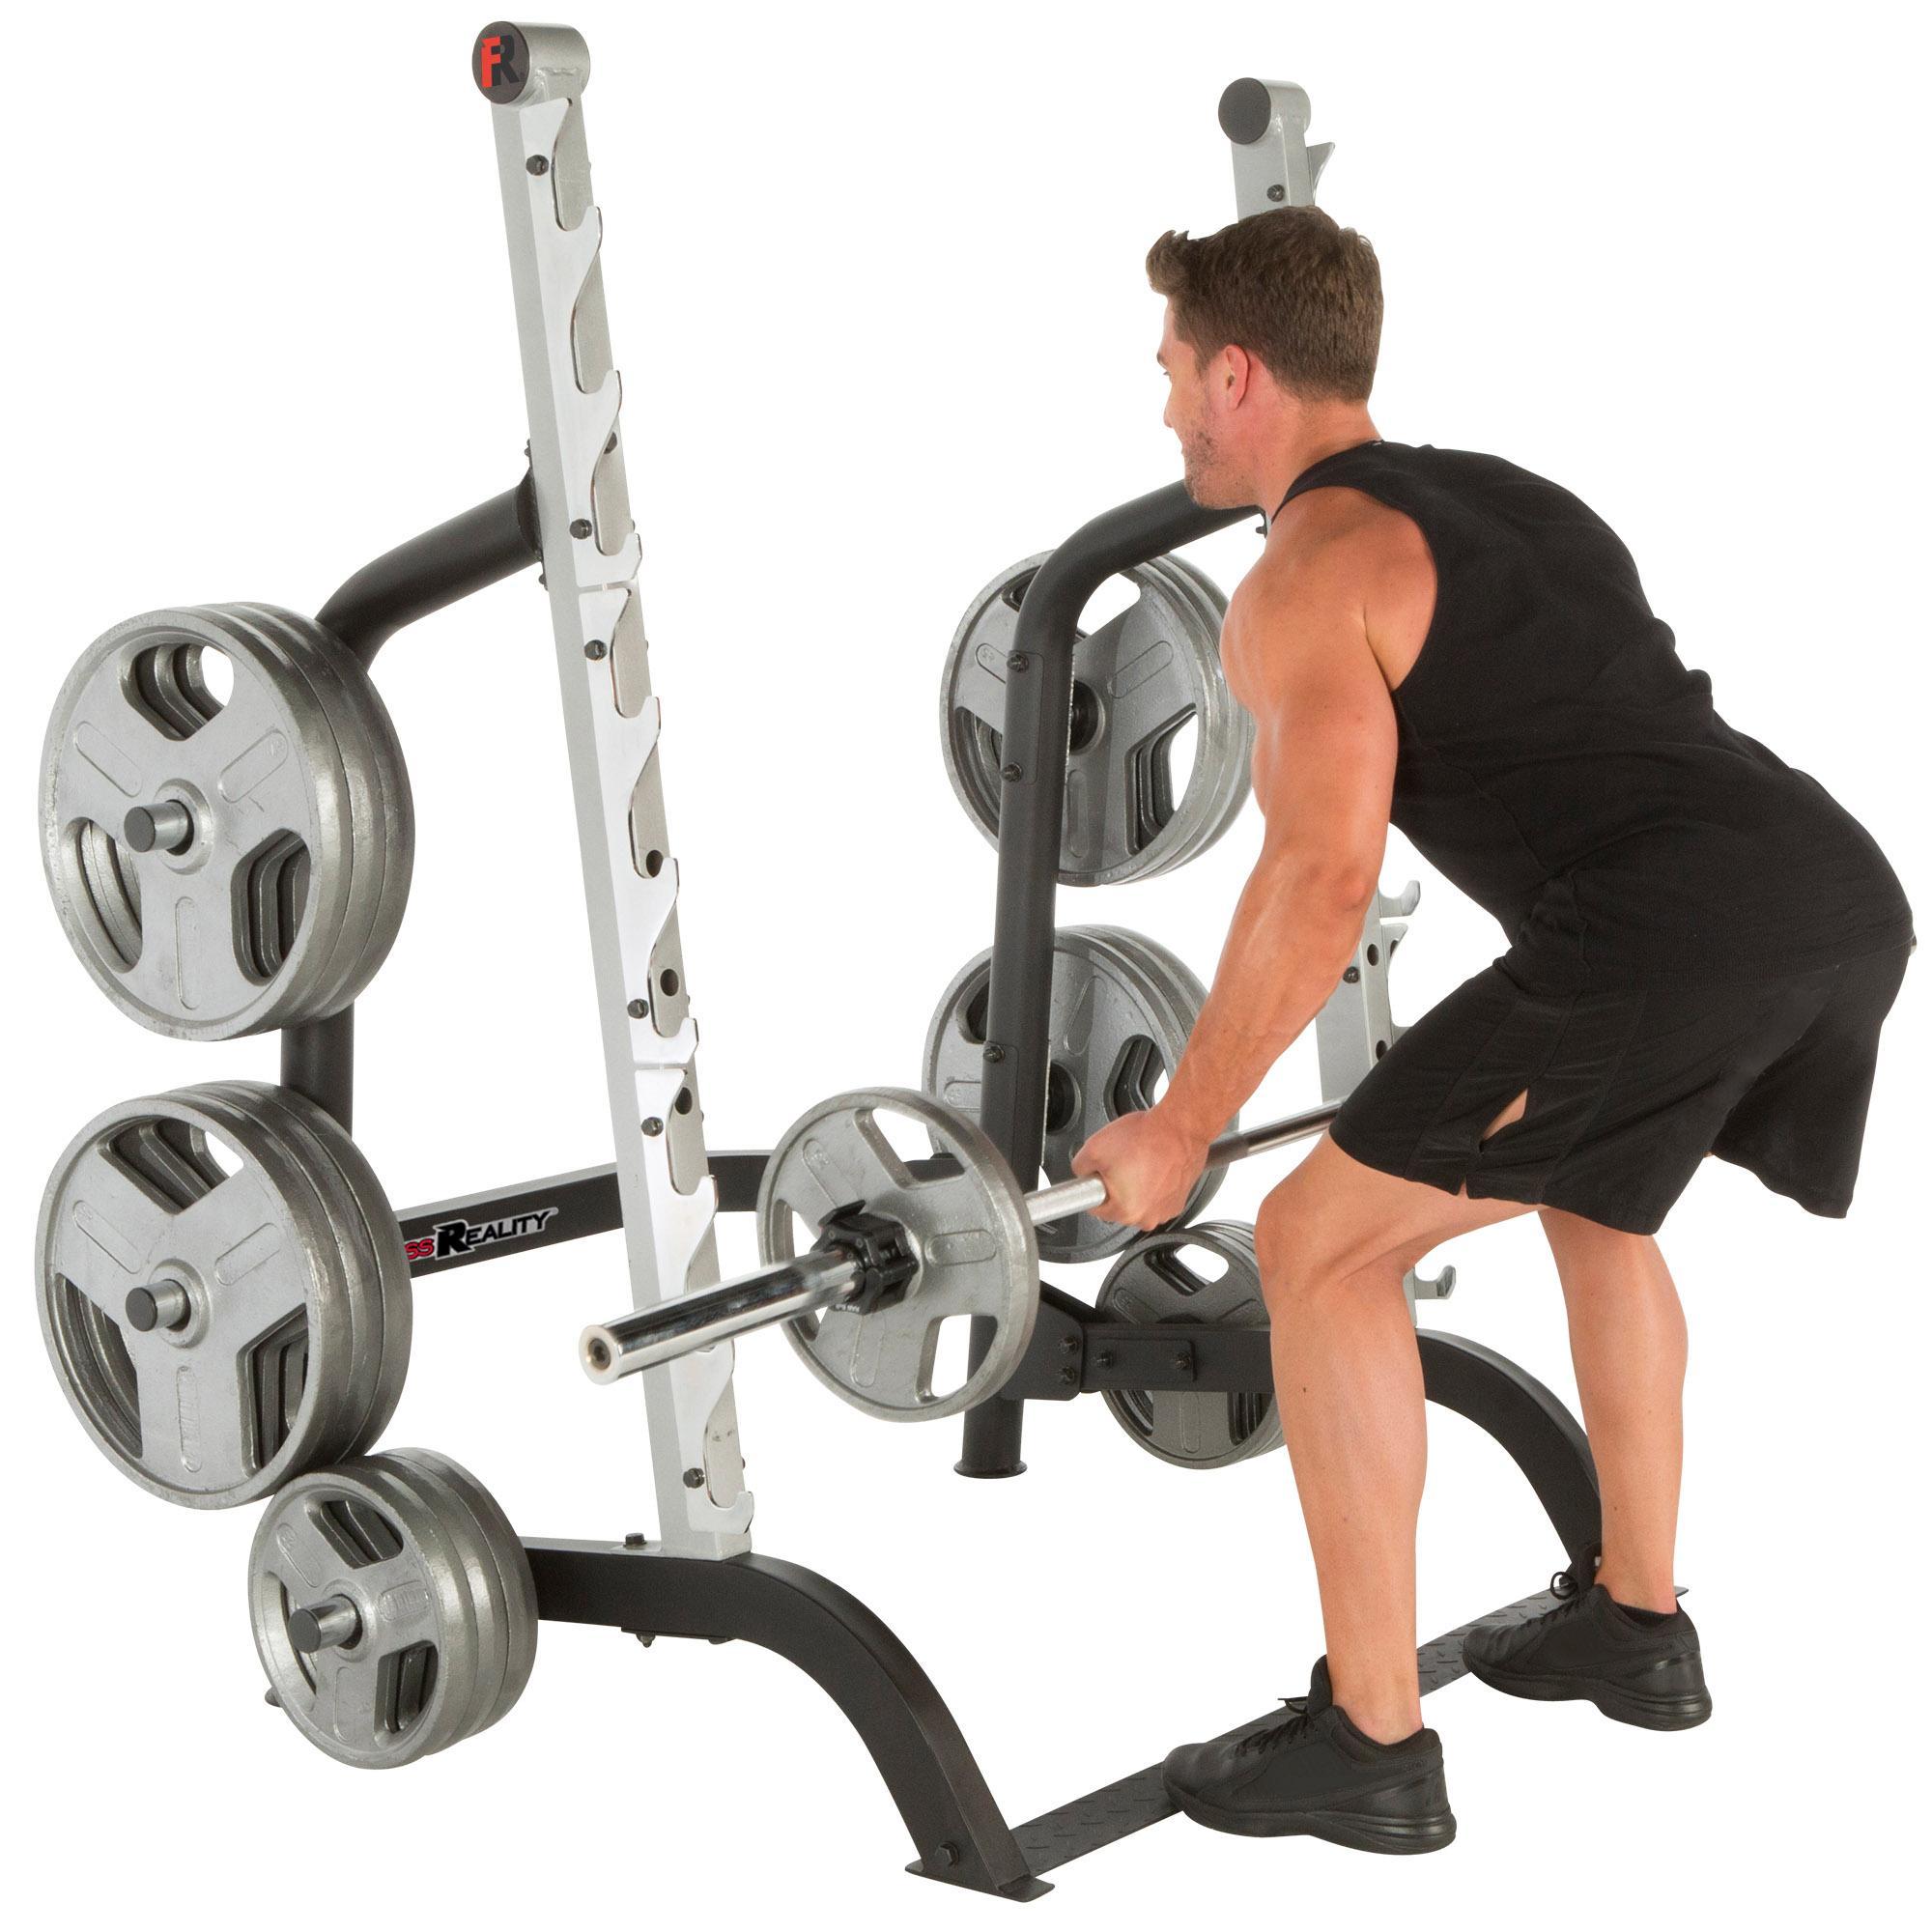 Amazon.com : Fitness Reality X-Class 1500Lb High Capacity